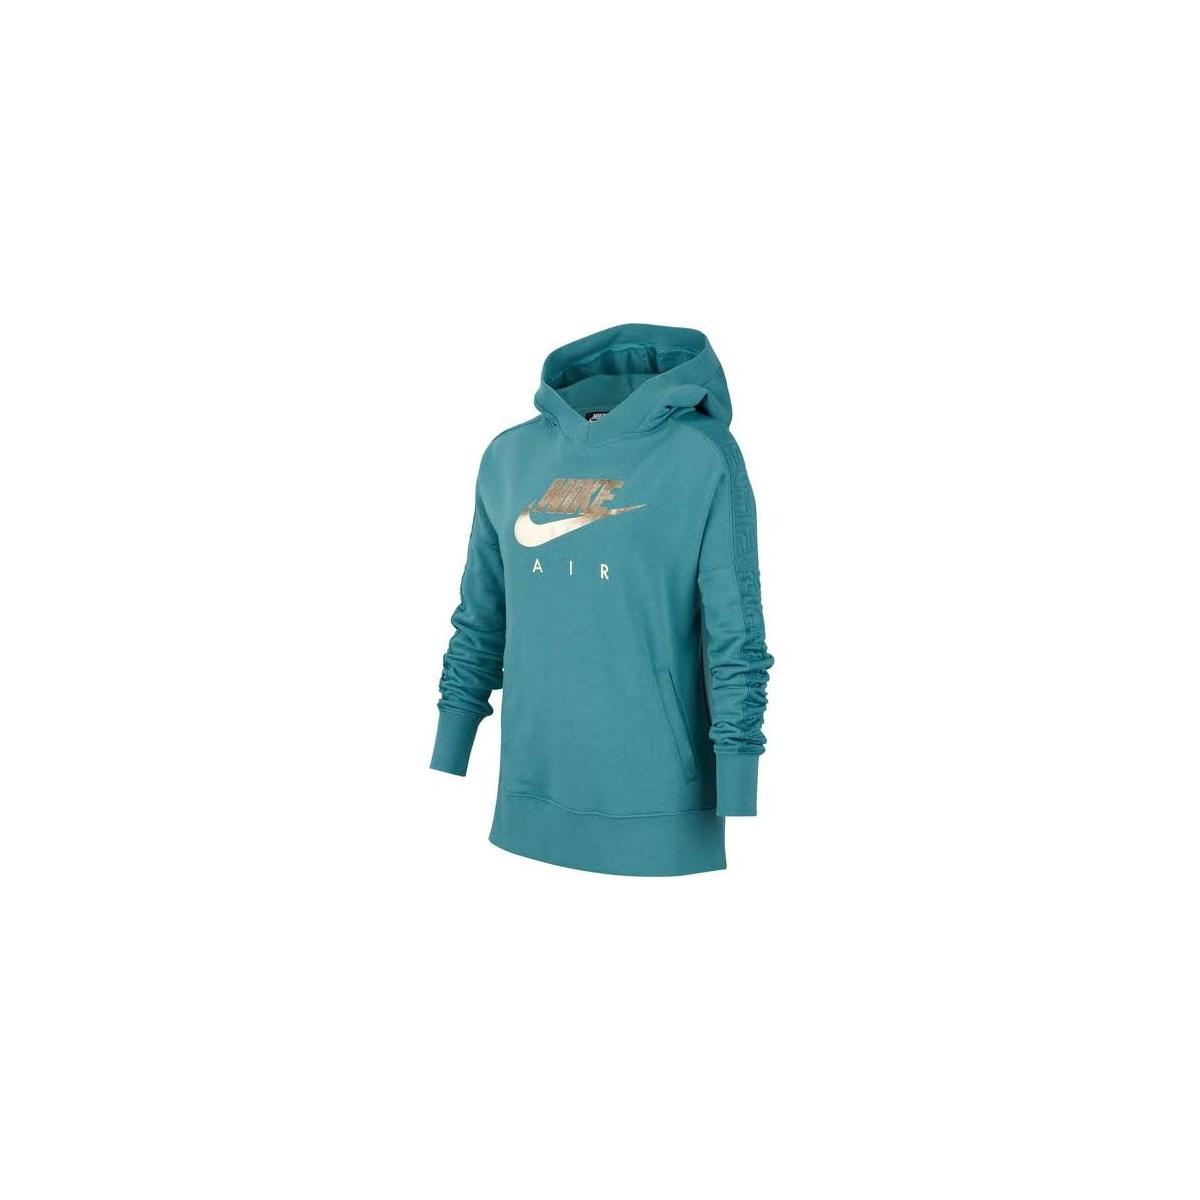 Air Pullover Çocuk Yeşil Sweatshirt (BV2709-364)